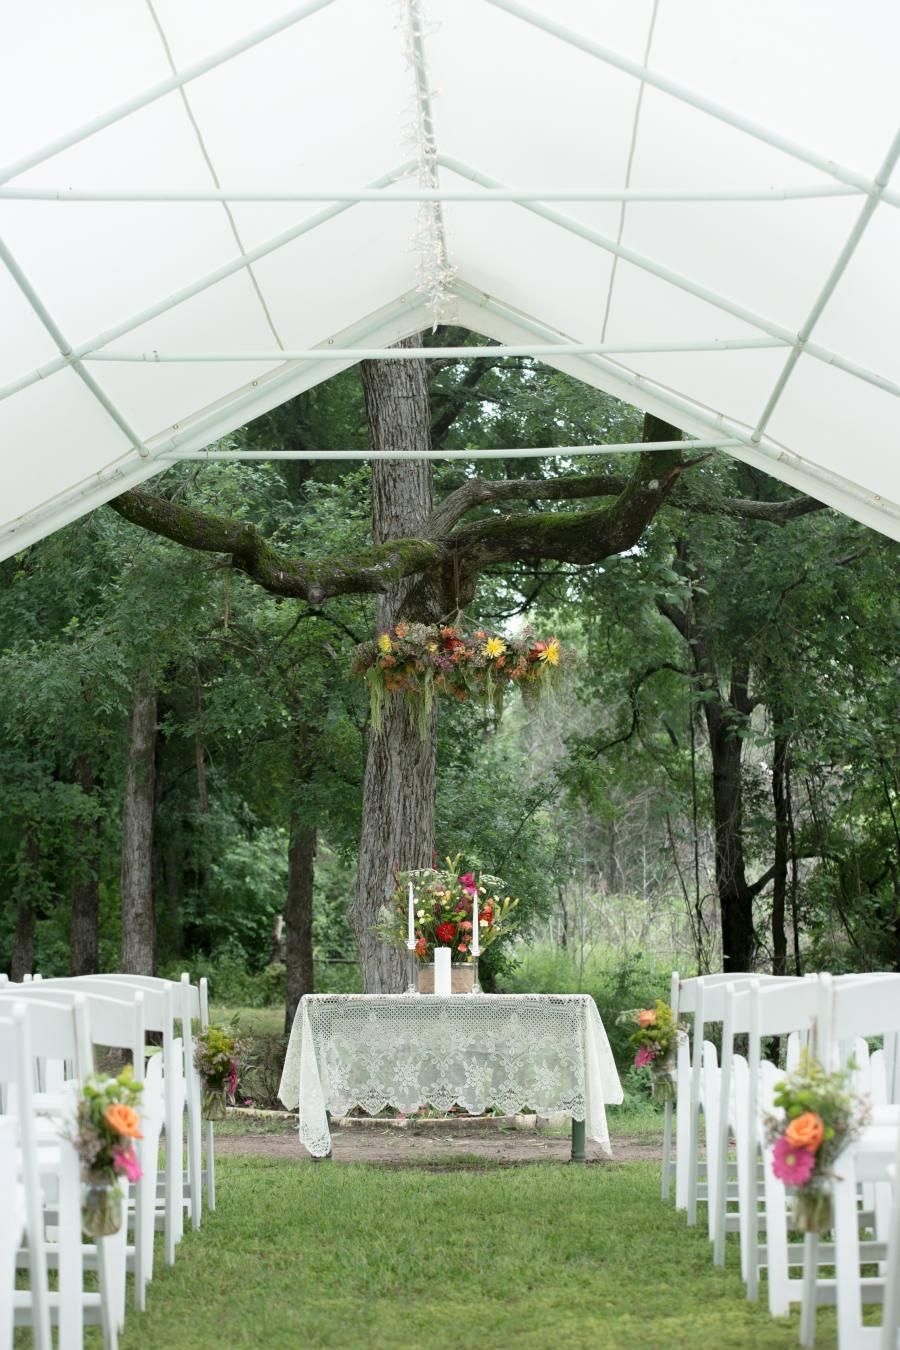 HighDot-Studios-Wedding-Cedar-Bend-Event-Center -Austin-Kim and Mike (15)